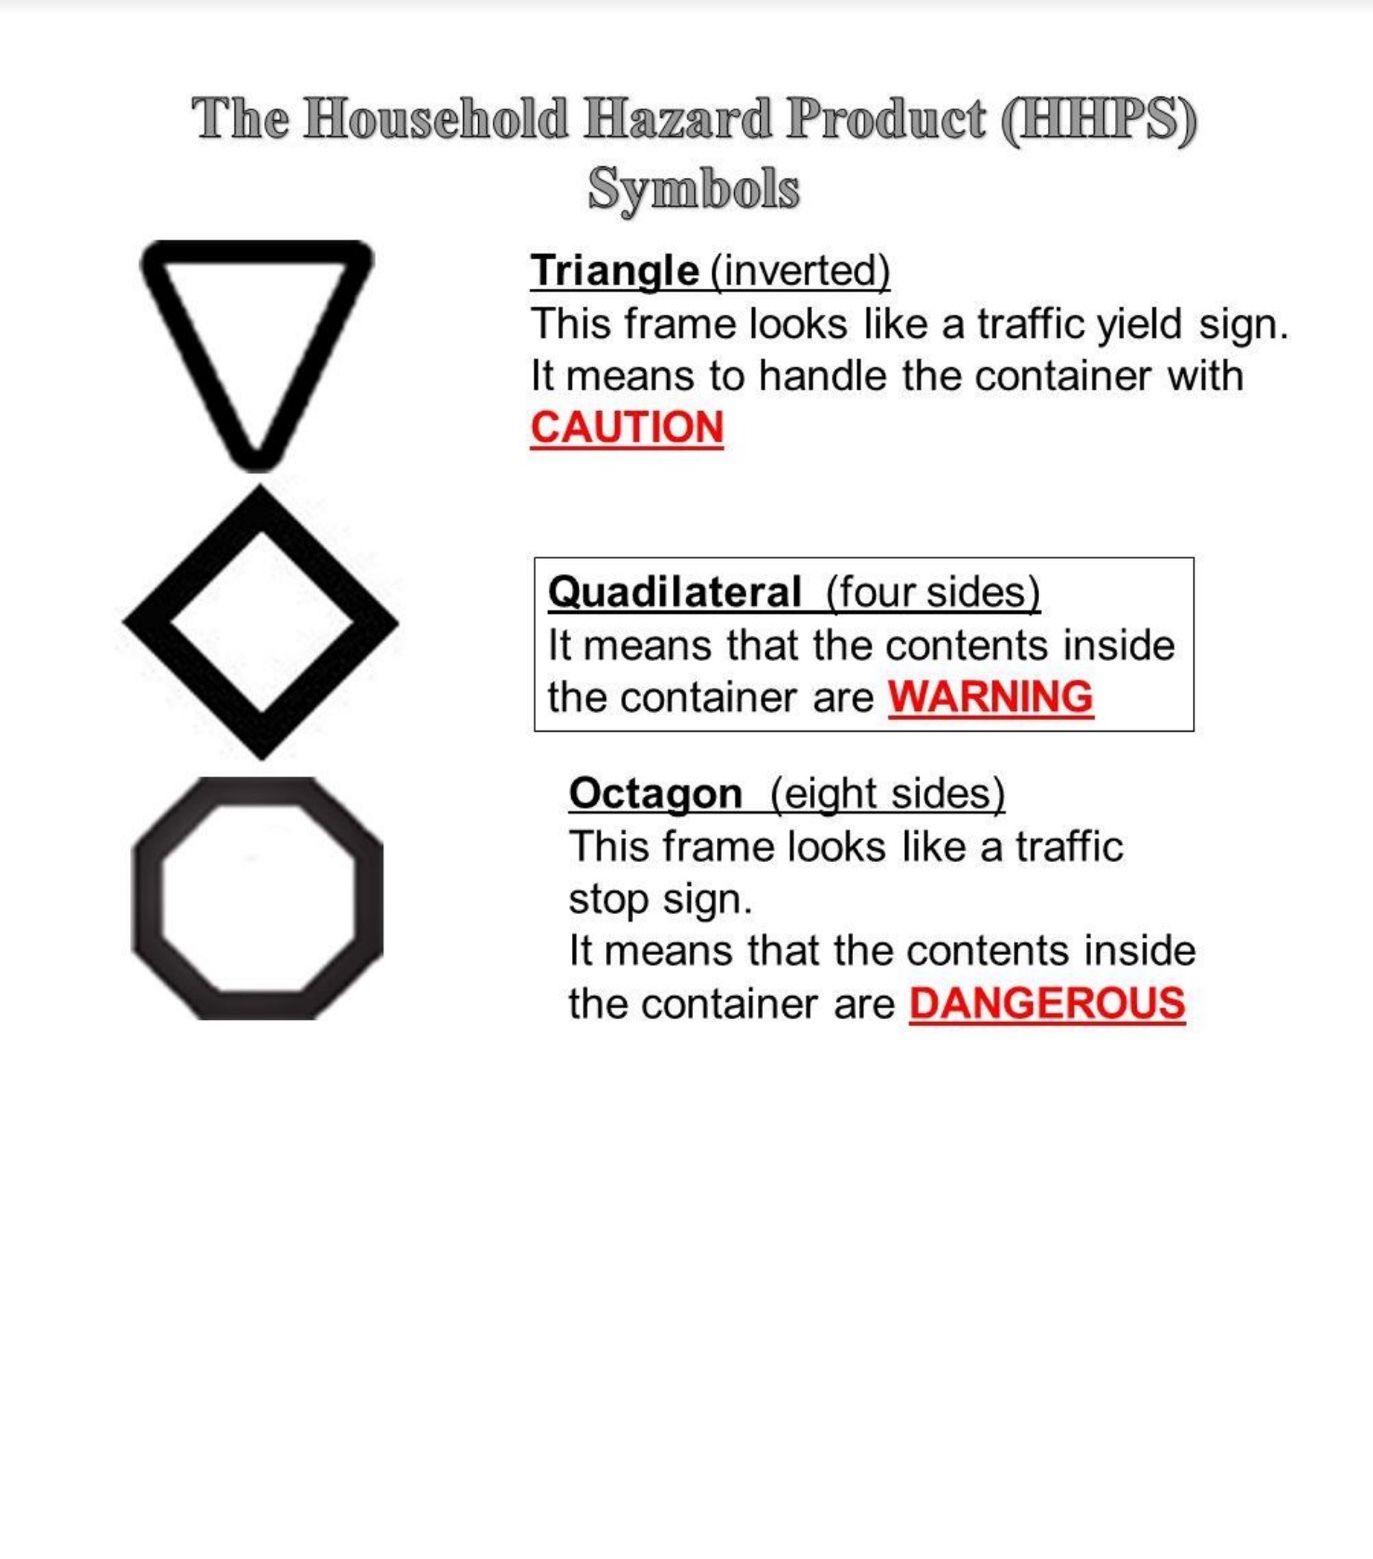 Blank Hhps Symbols Meaning Wednesday February 7 2018 Safety